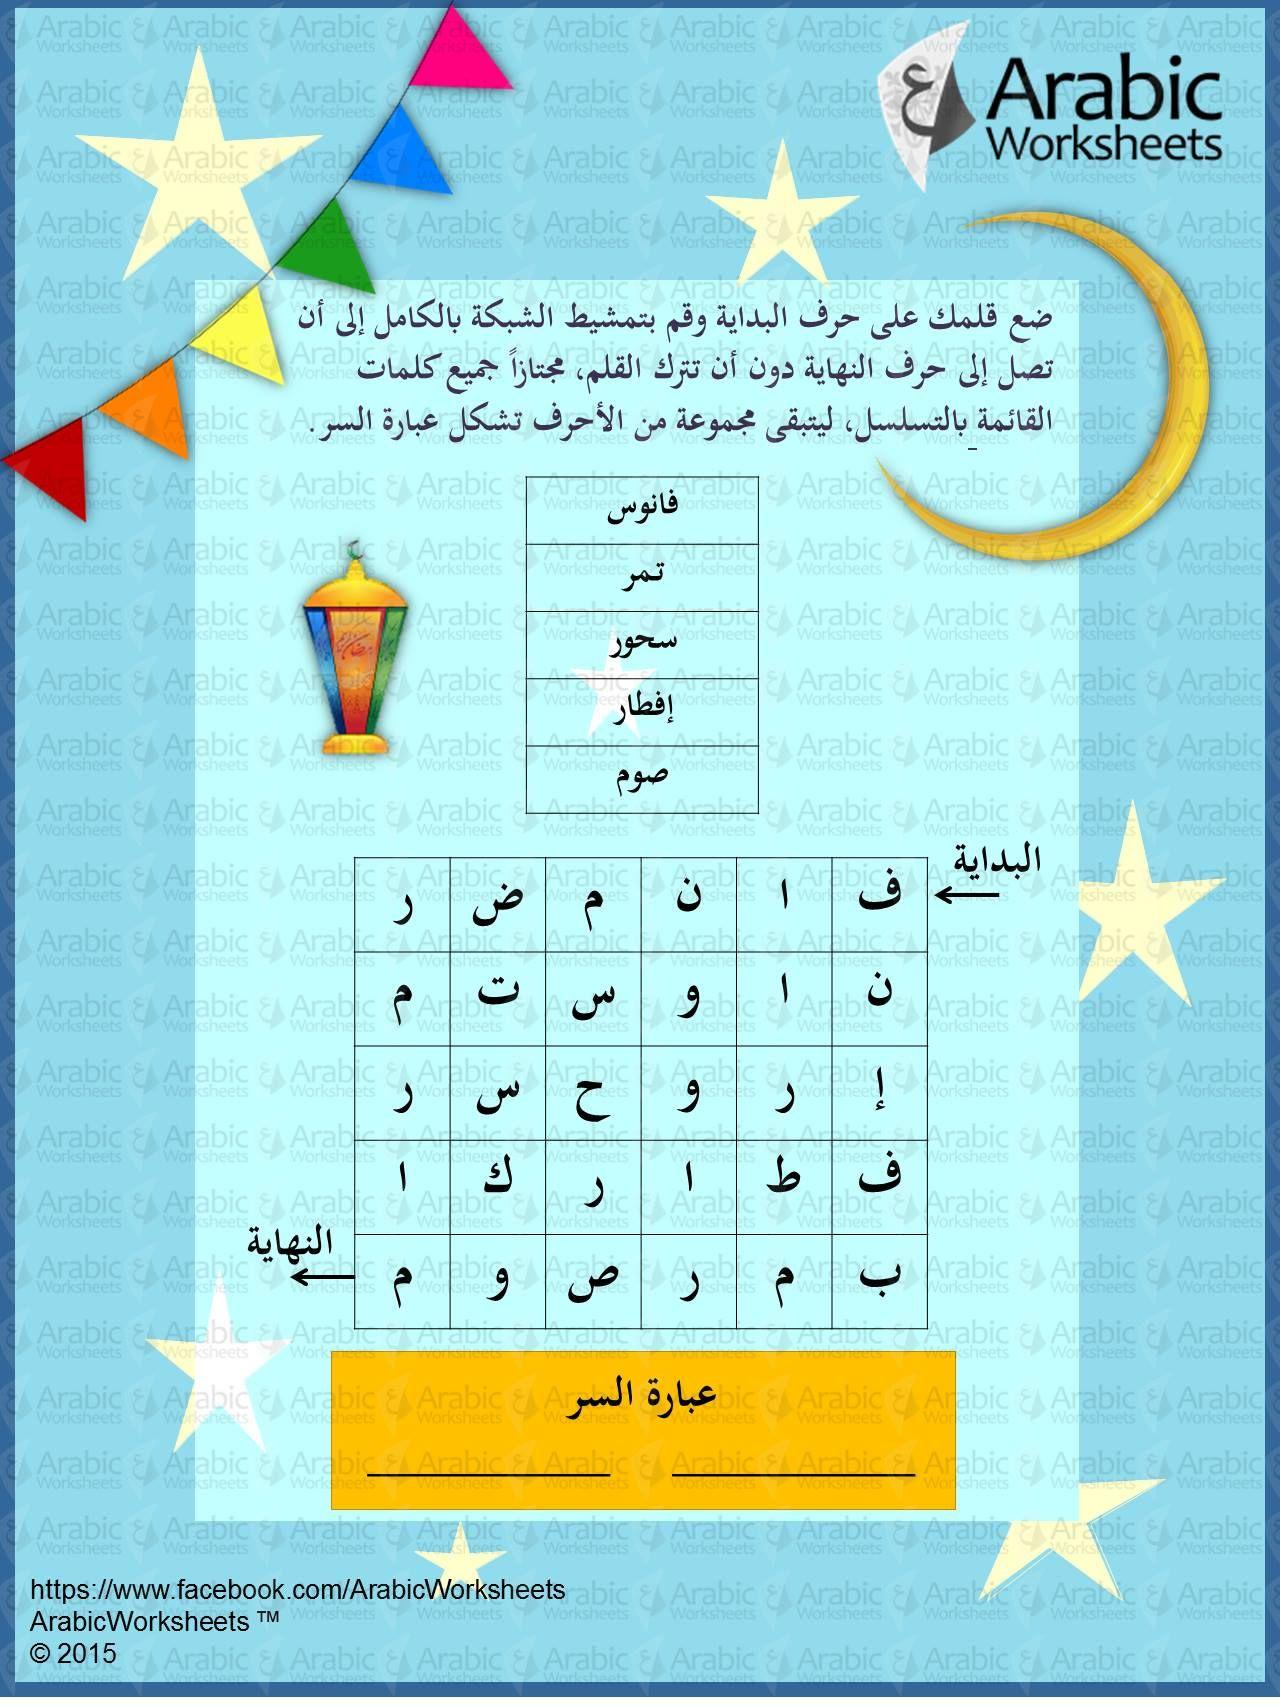 Fiche arabic worksheets sur fb | Arabic the language of the soul ...